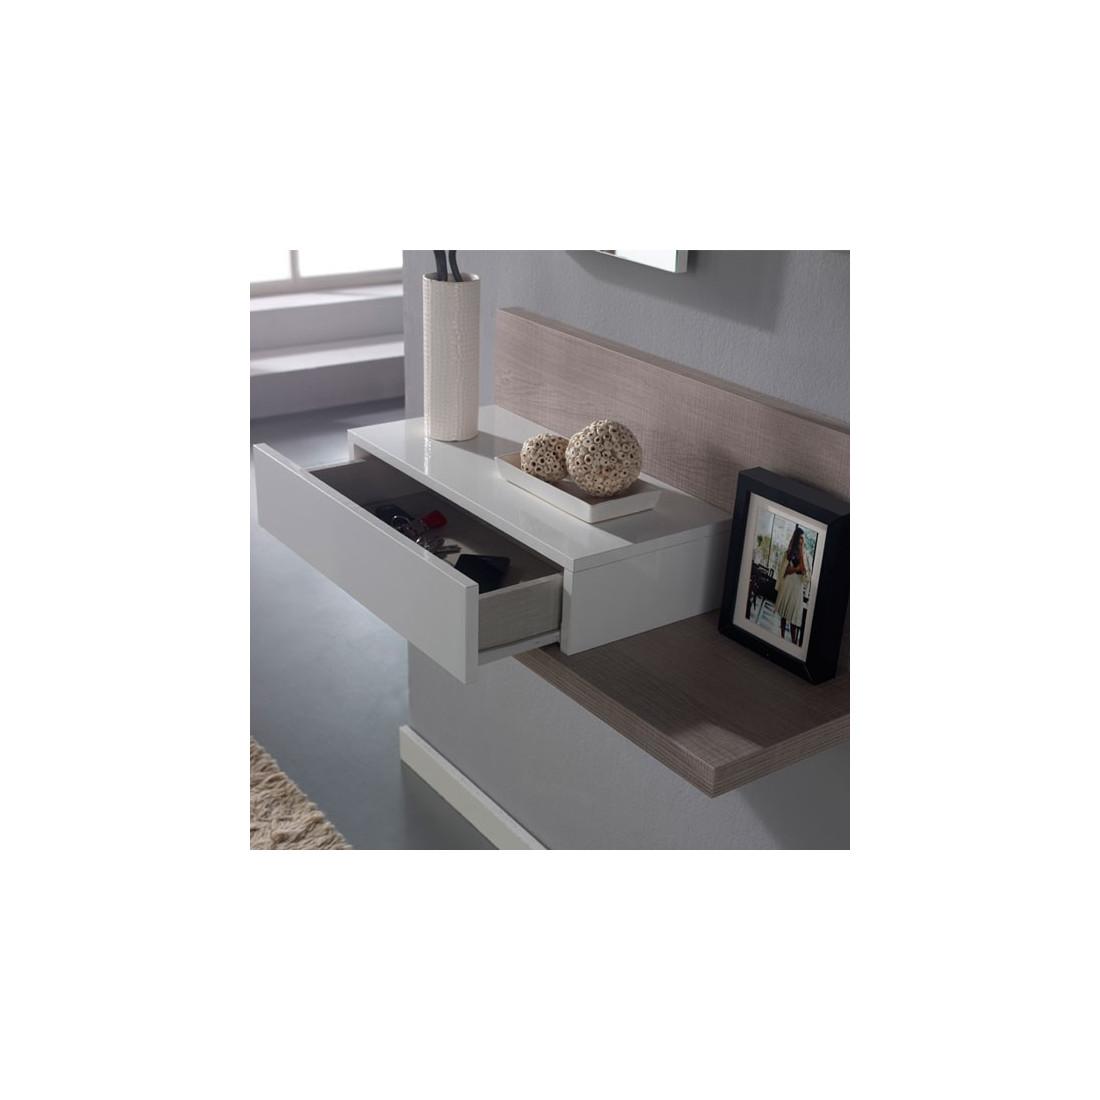 Meuble d 39 entr e blanc ch ne clair miroir lisia petits meubles - Meuble entree suspendu ...